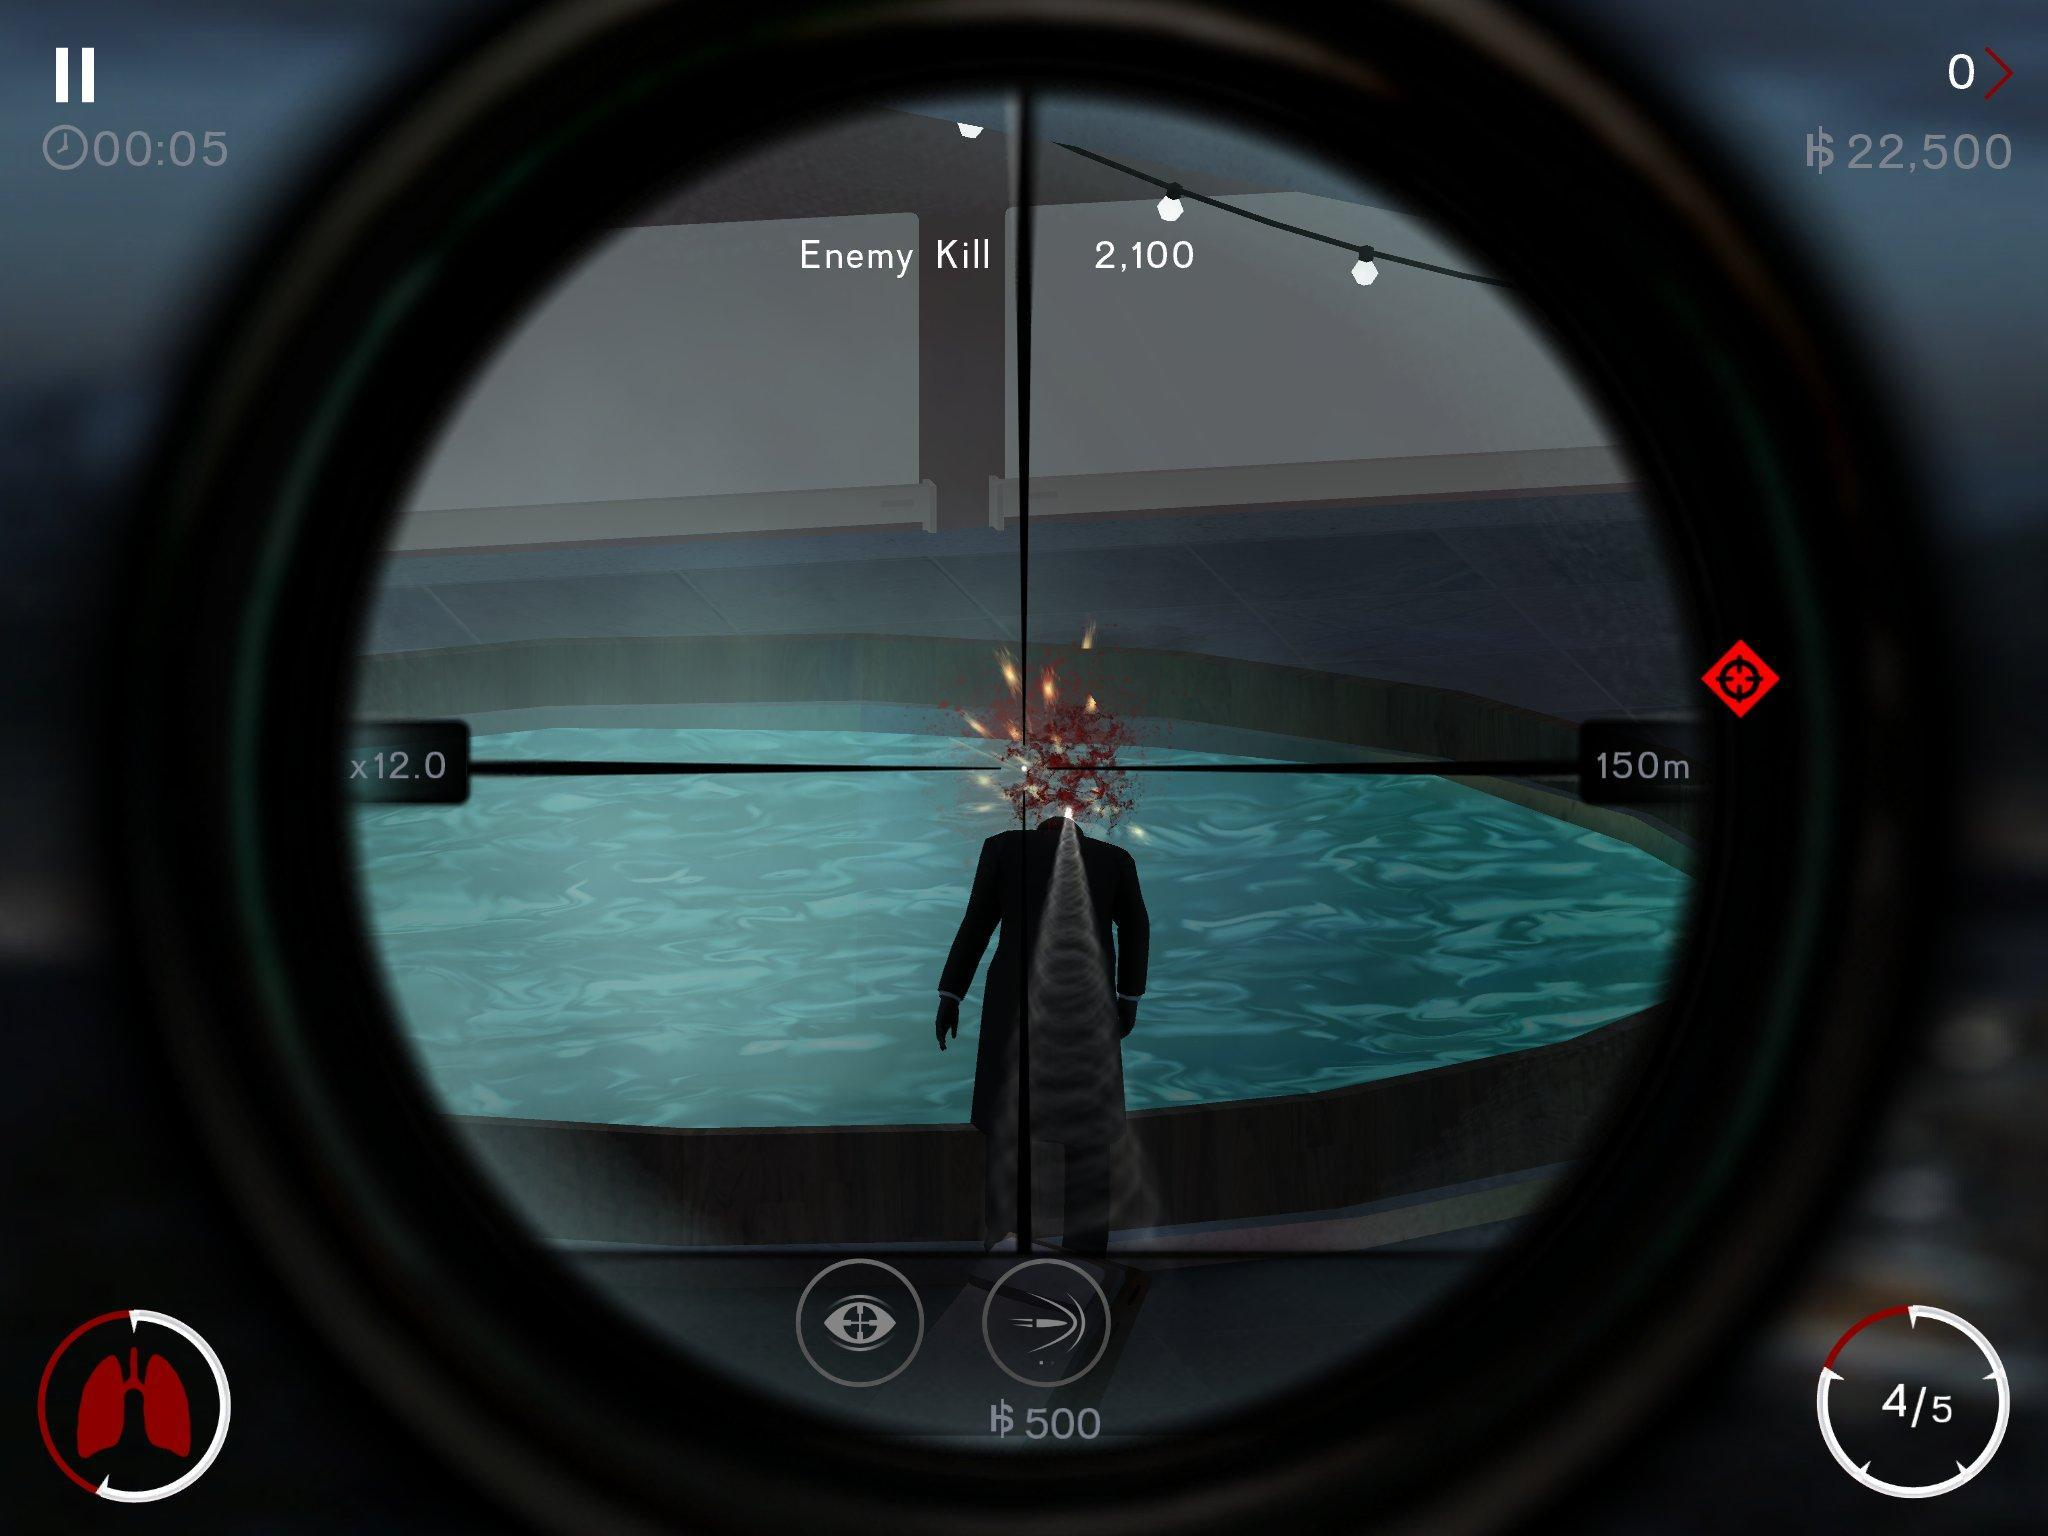 Trick For Hitman Sniper para Android - APK Baixar